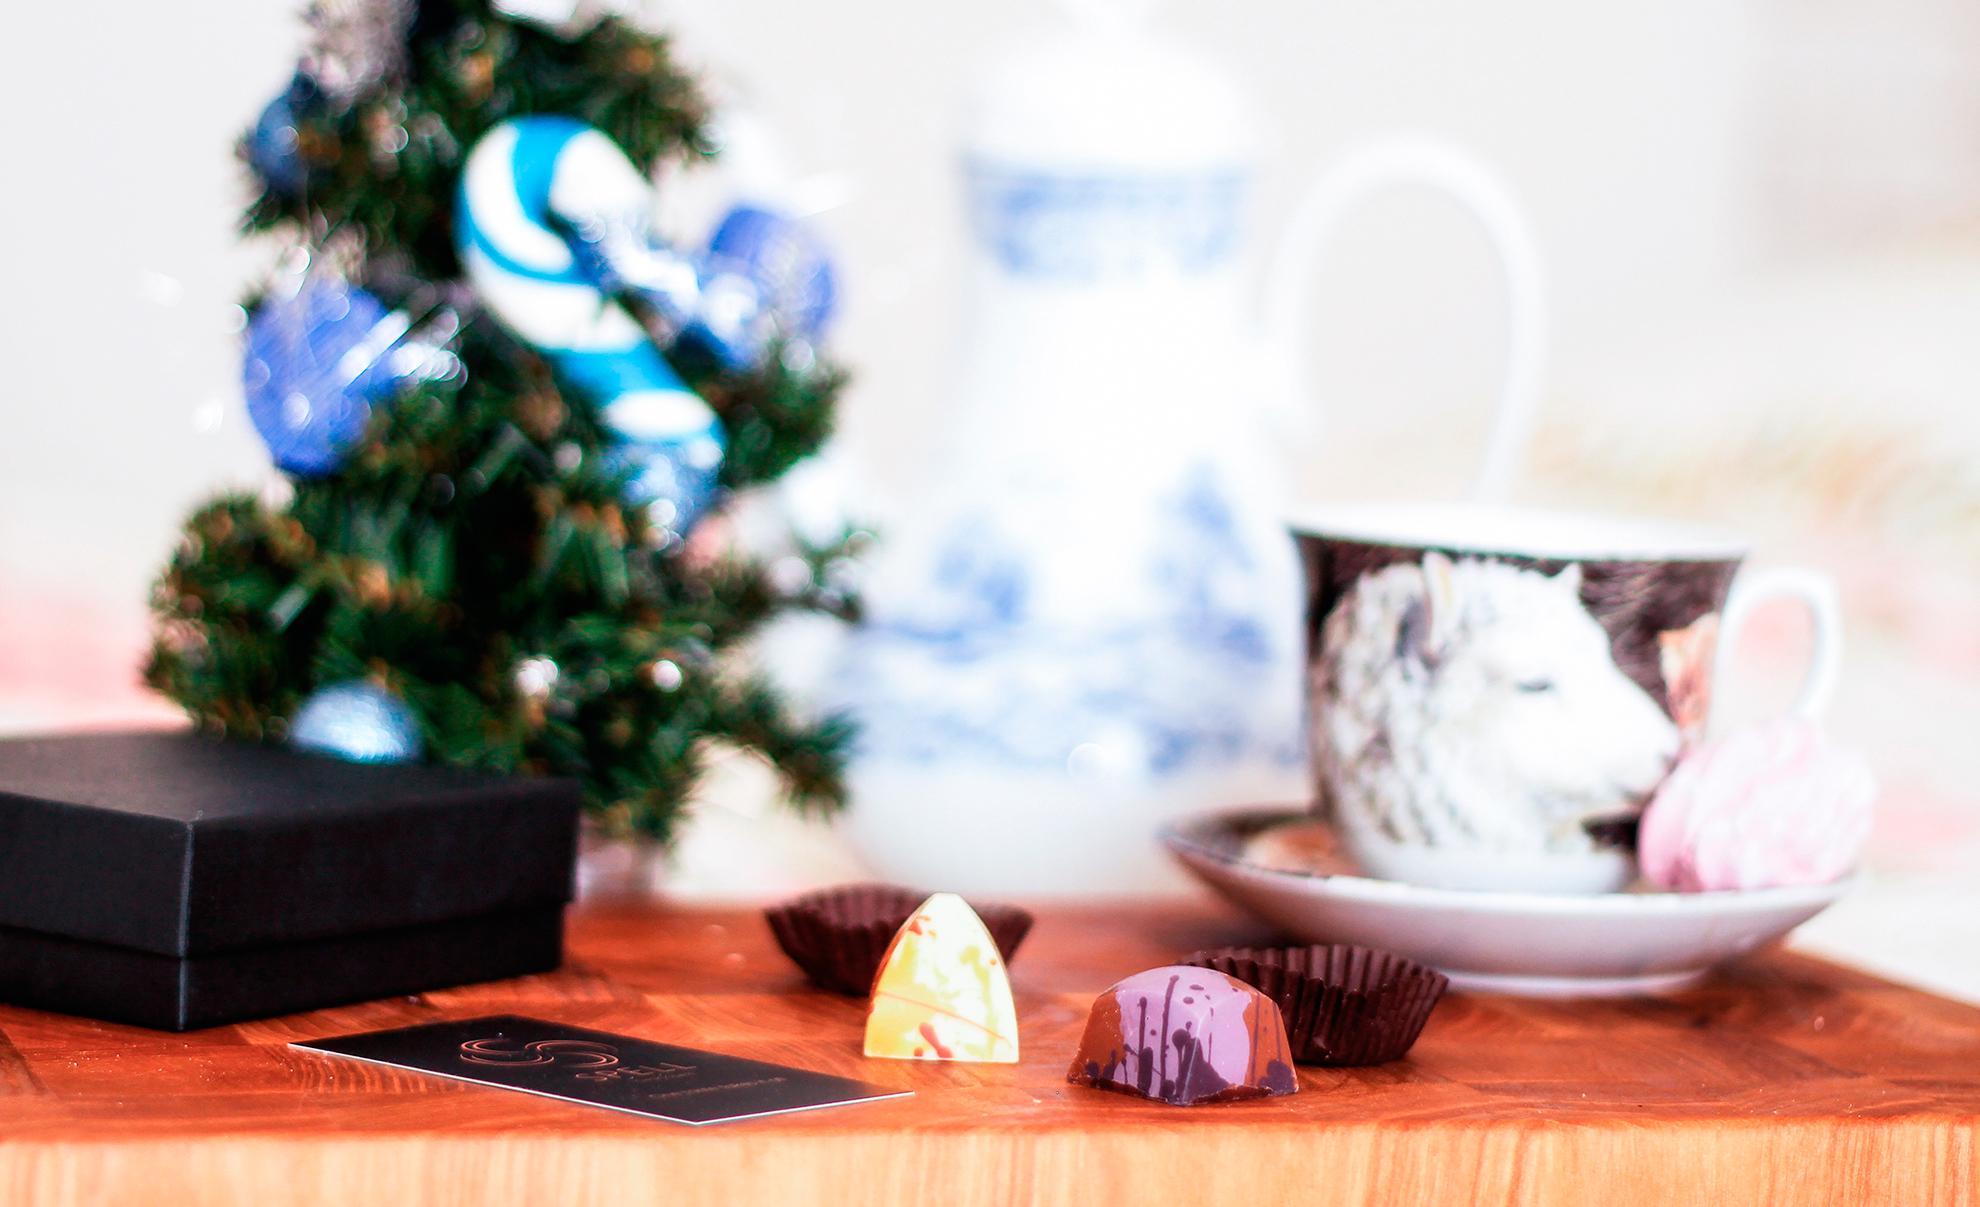 шоколадные конфеты spell